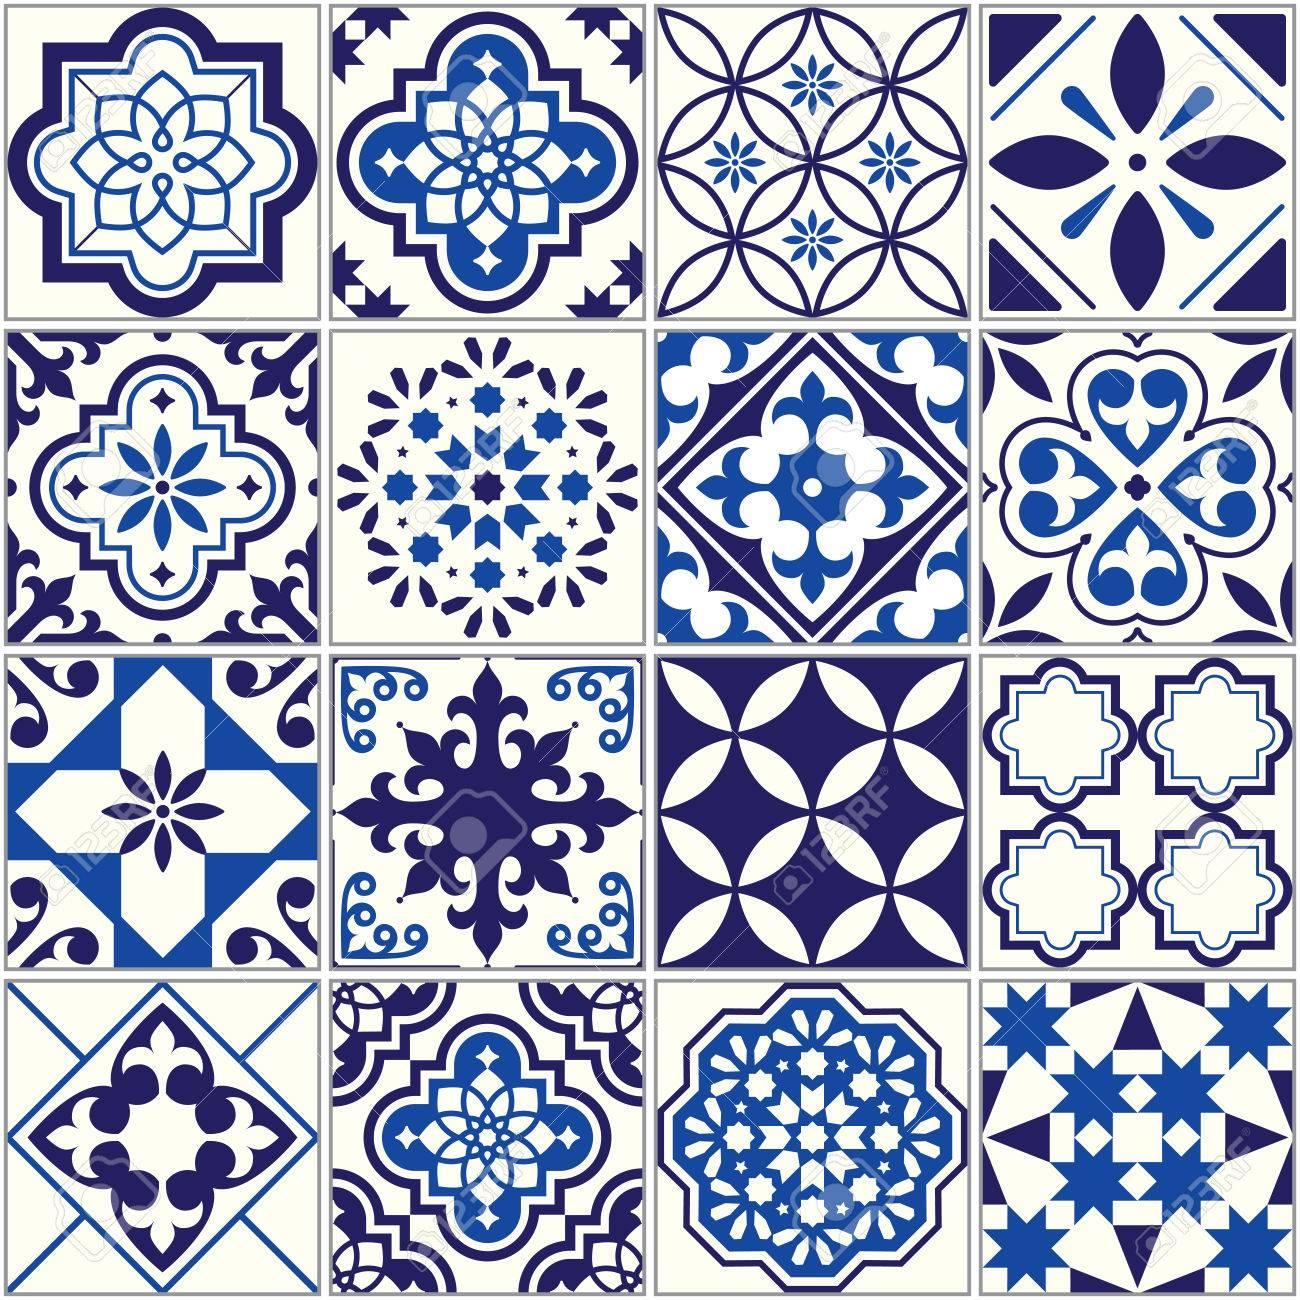 Vector tile pattern, Lisbon floral mosaic, Mediterranean seamless navy blue ornament - 81635676